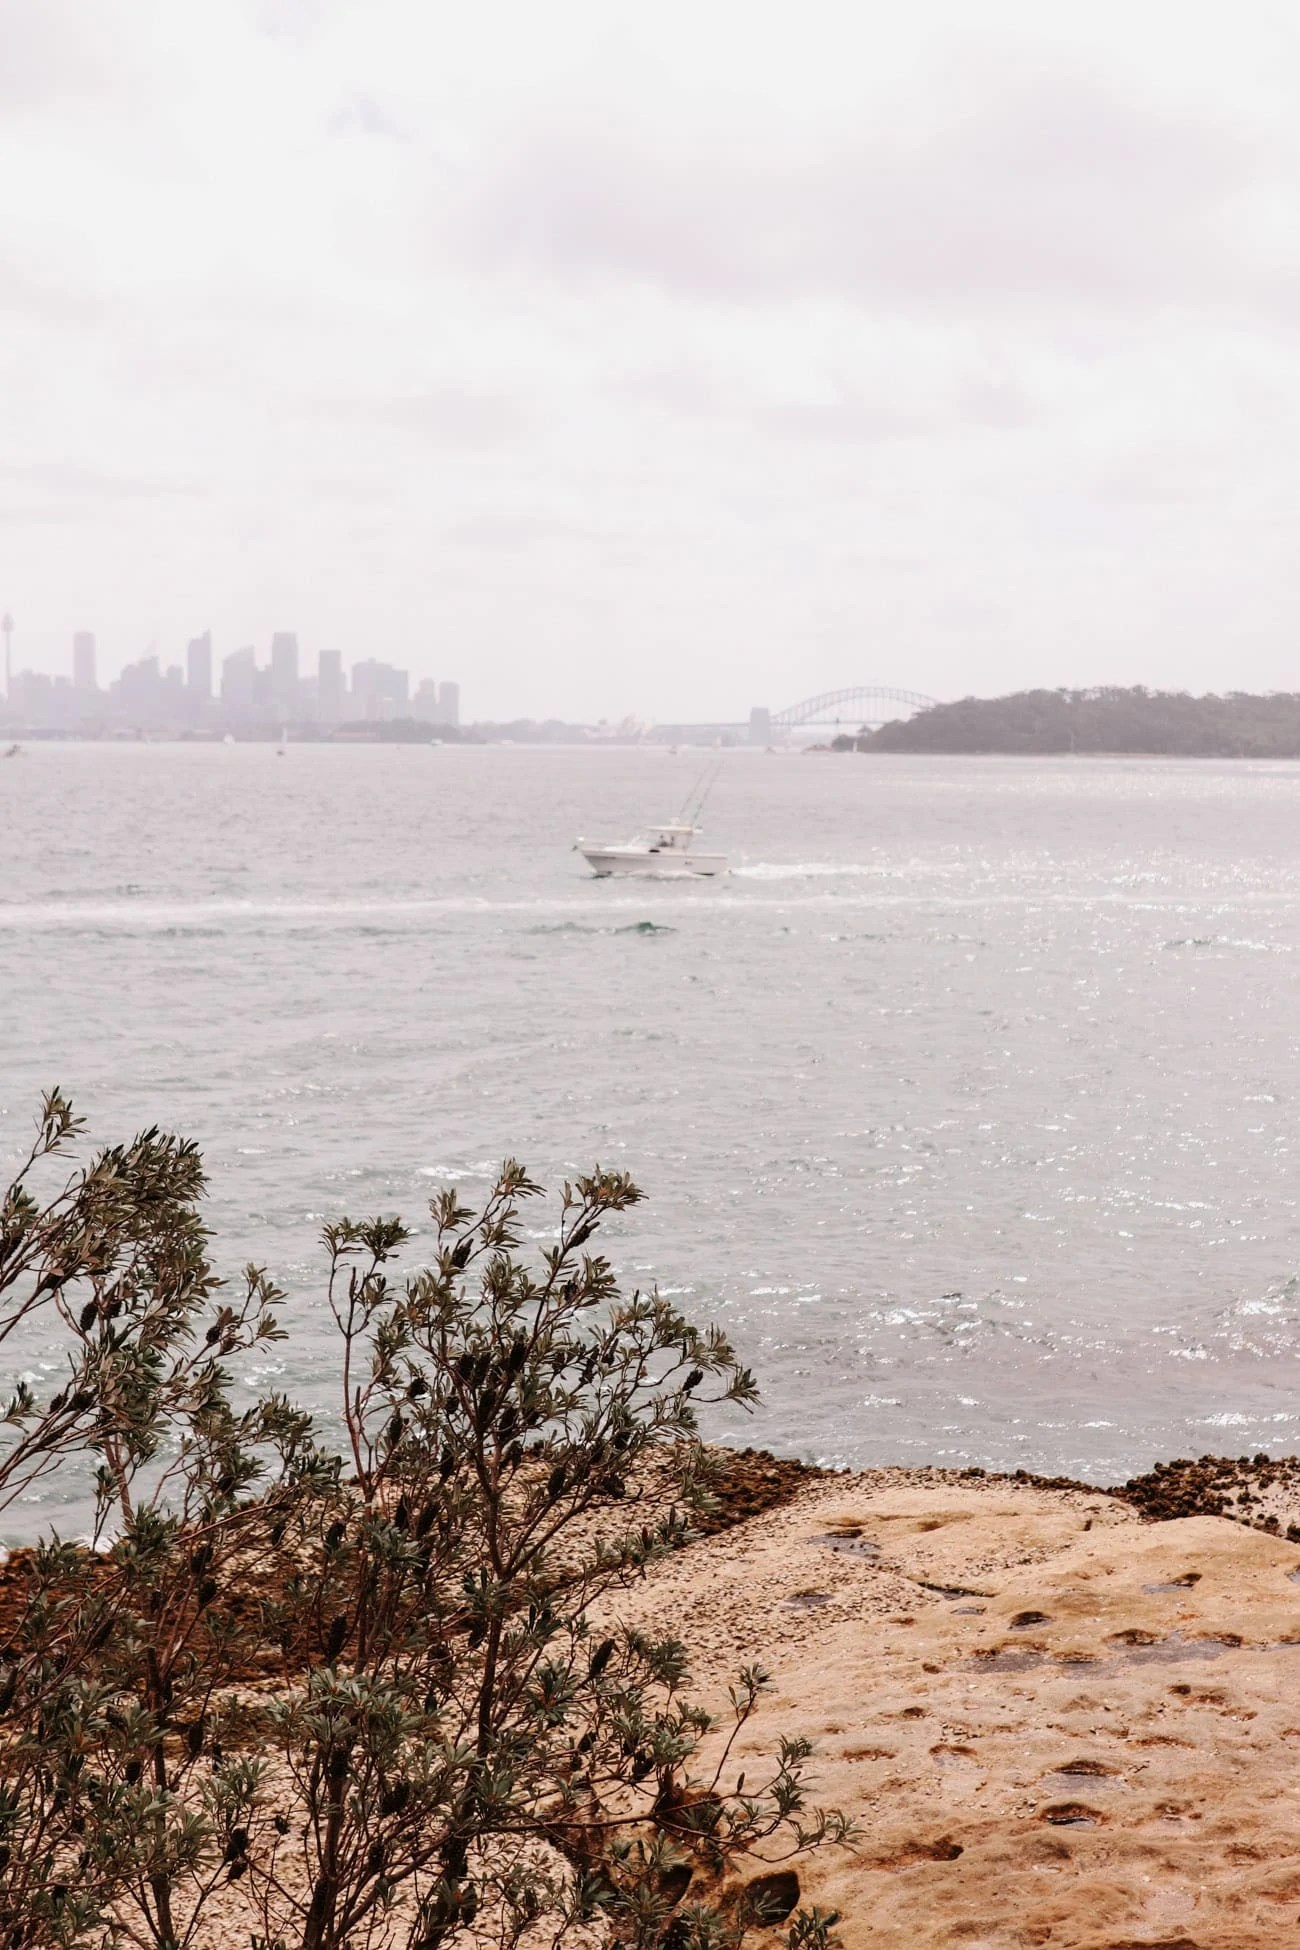 Vaucluse, Sydney